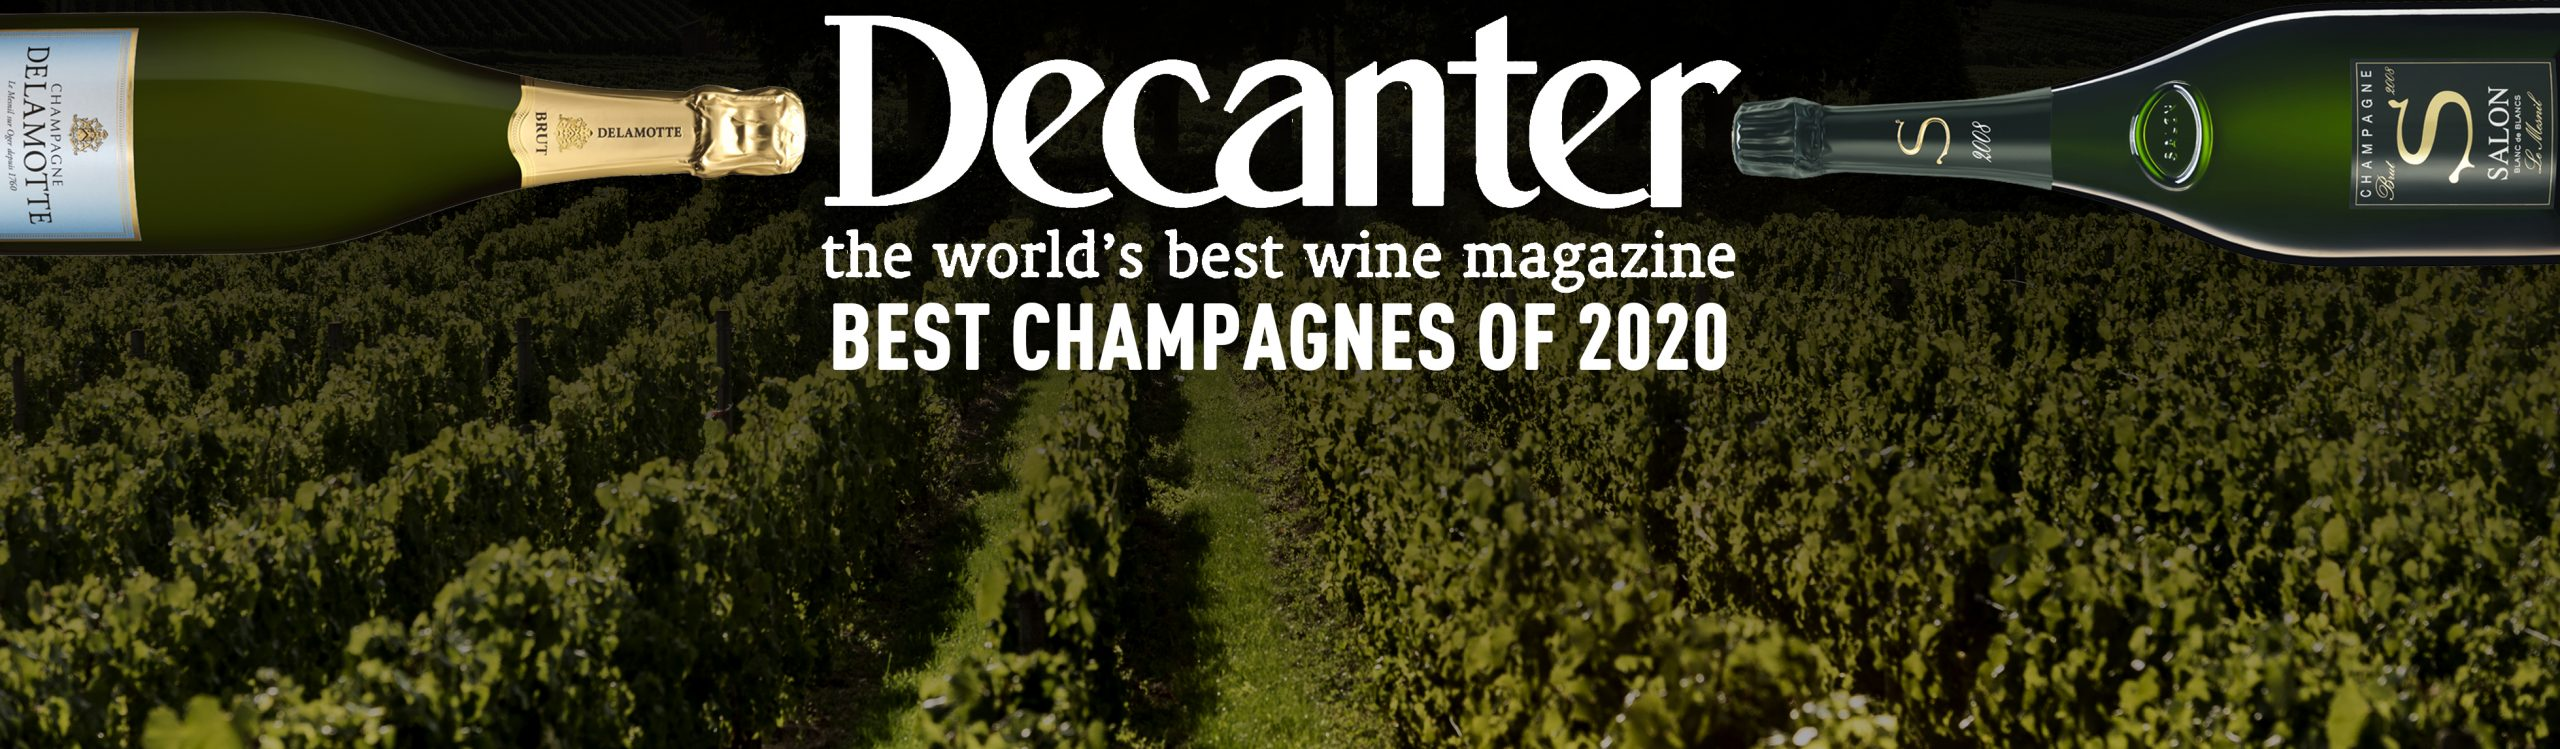 Salon & Delamotte beste champagnes 2020 volgens Decanter